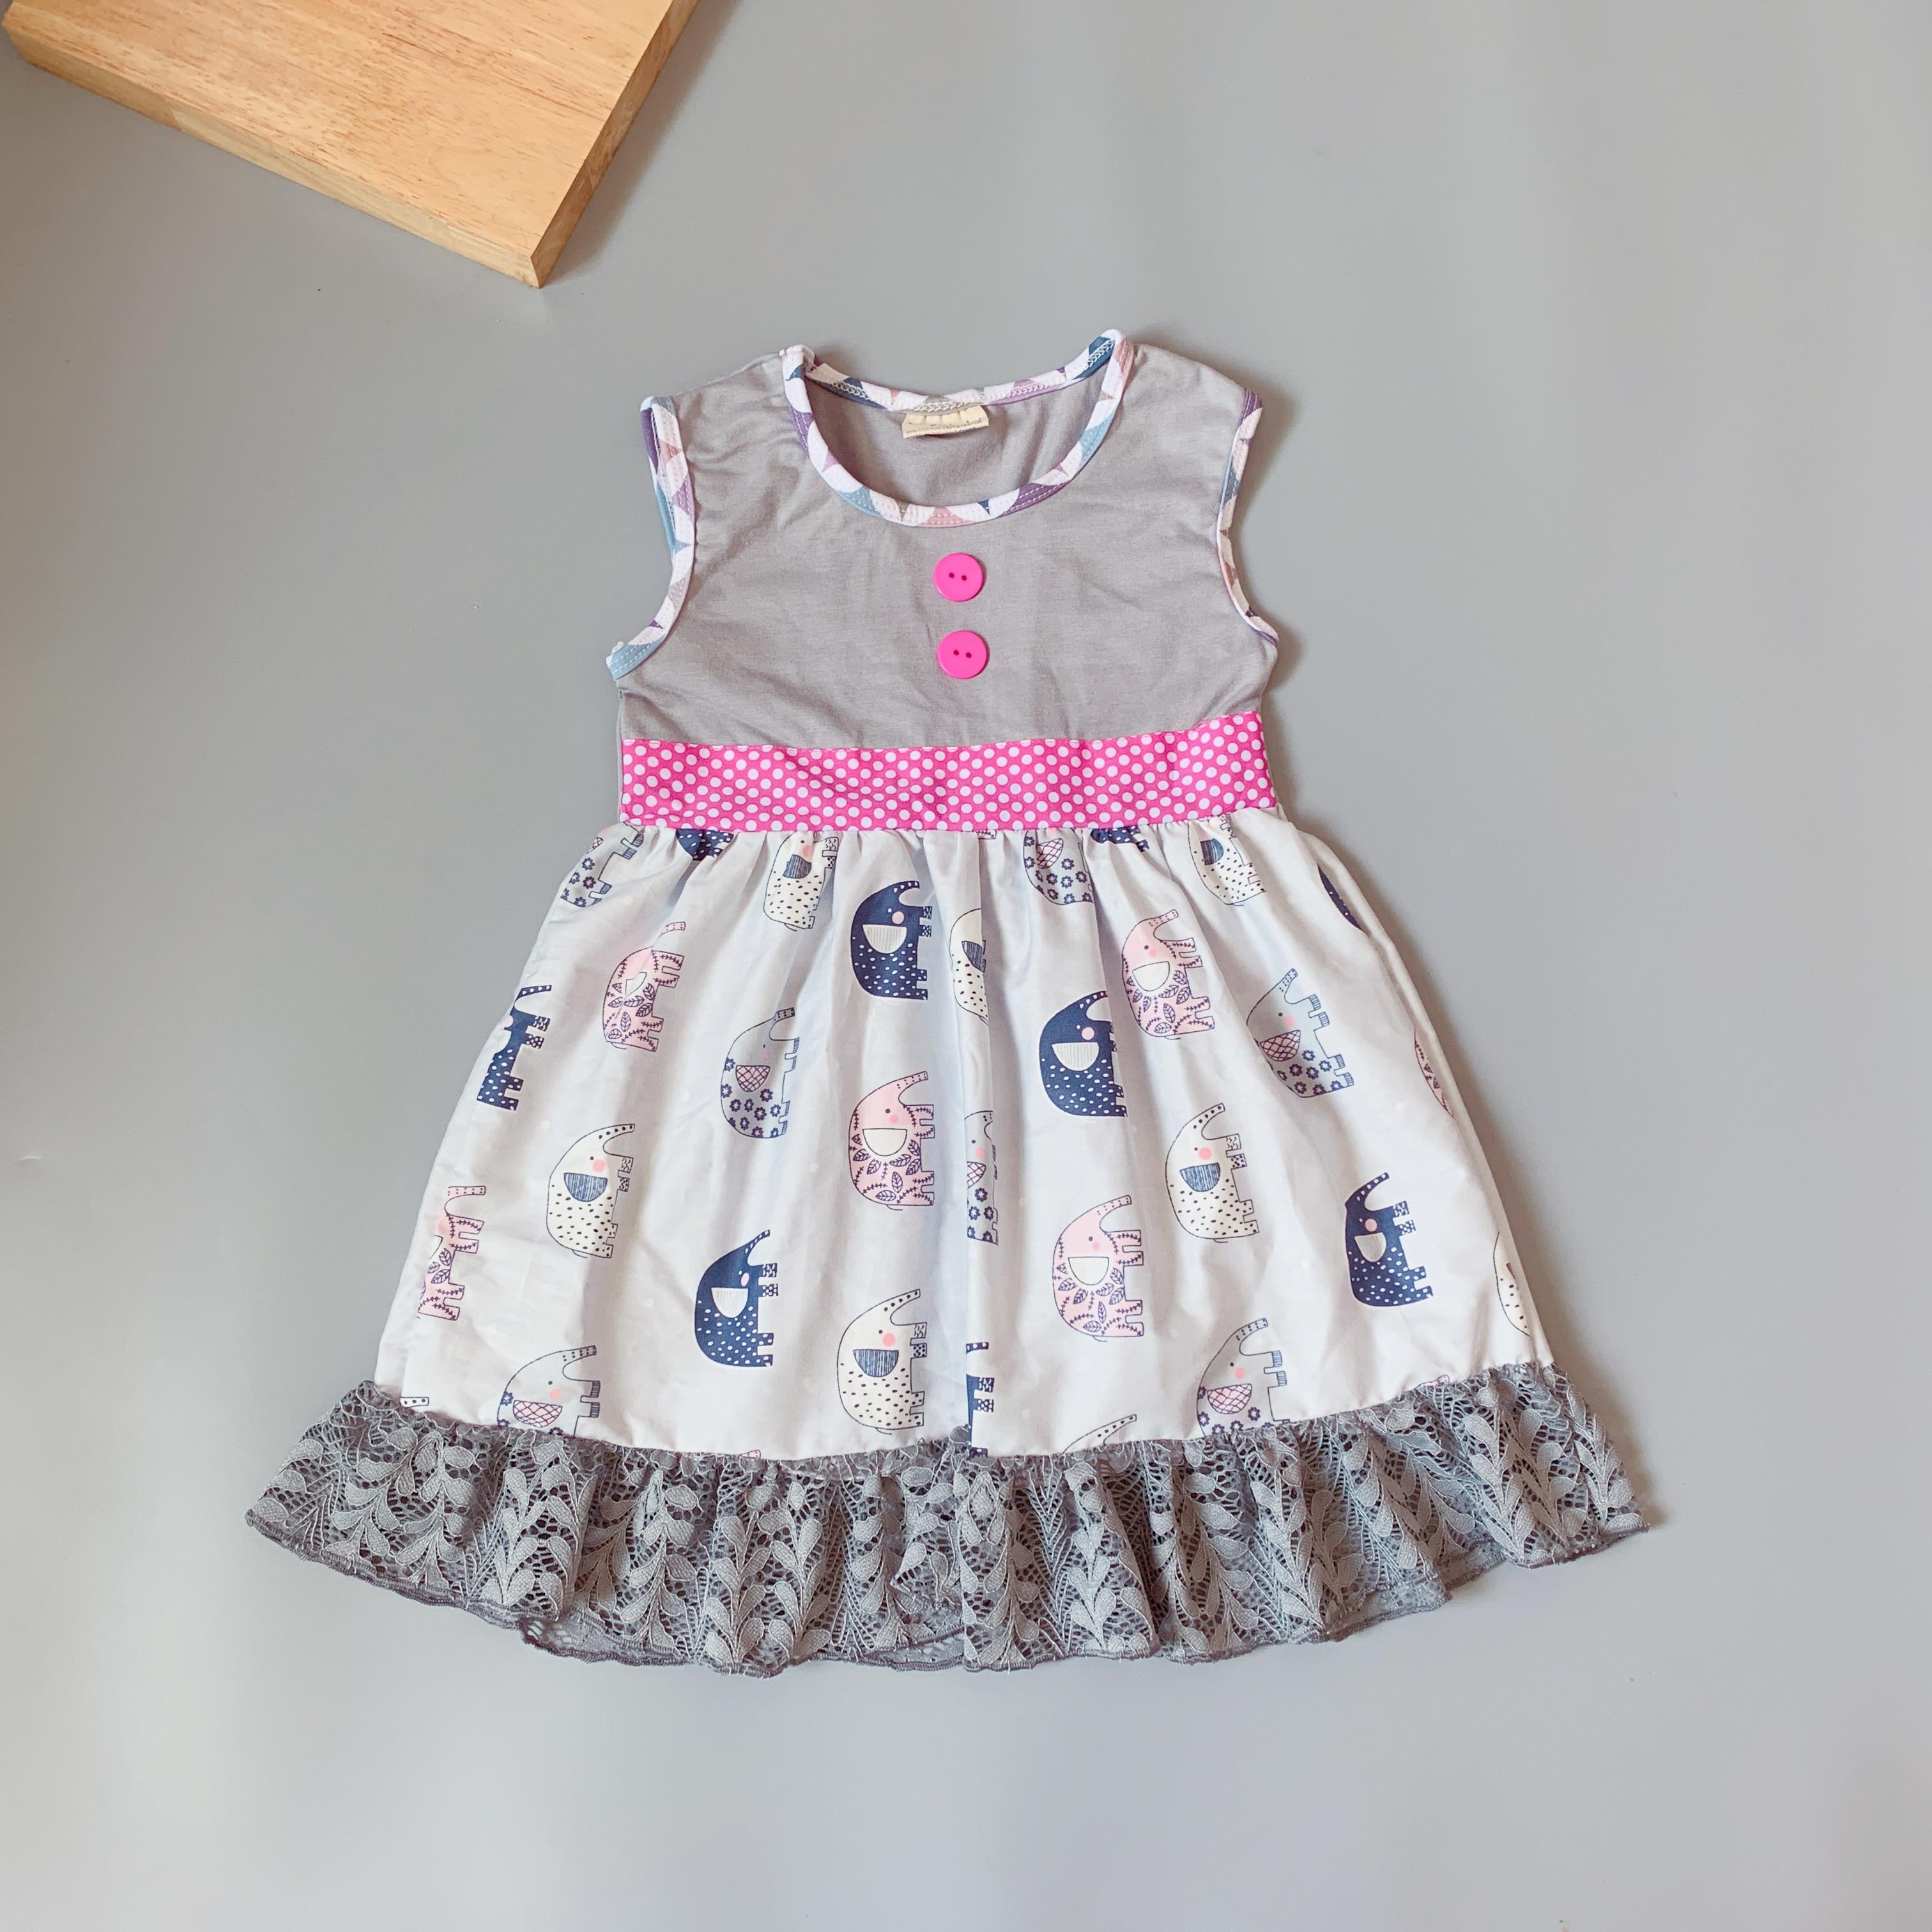 spring summer elephant boutique unique toddler dress